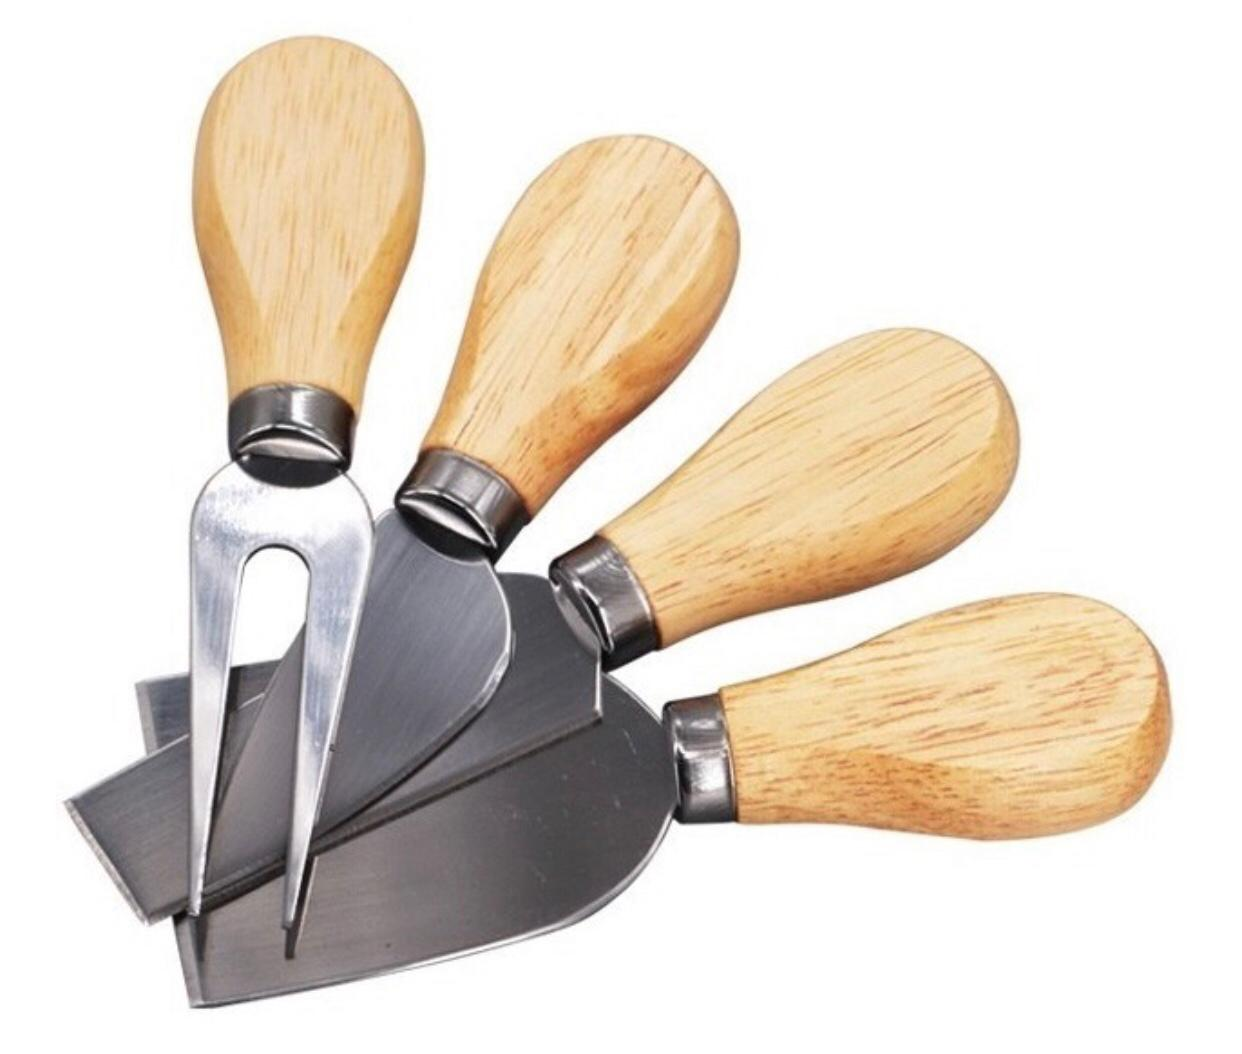 conjunto para queijos e frios faca cortador de queijo madeira e aço inox